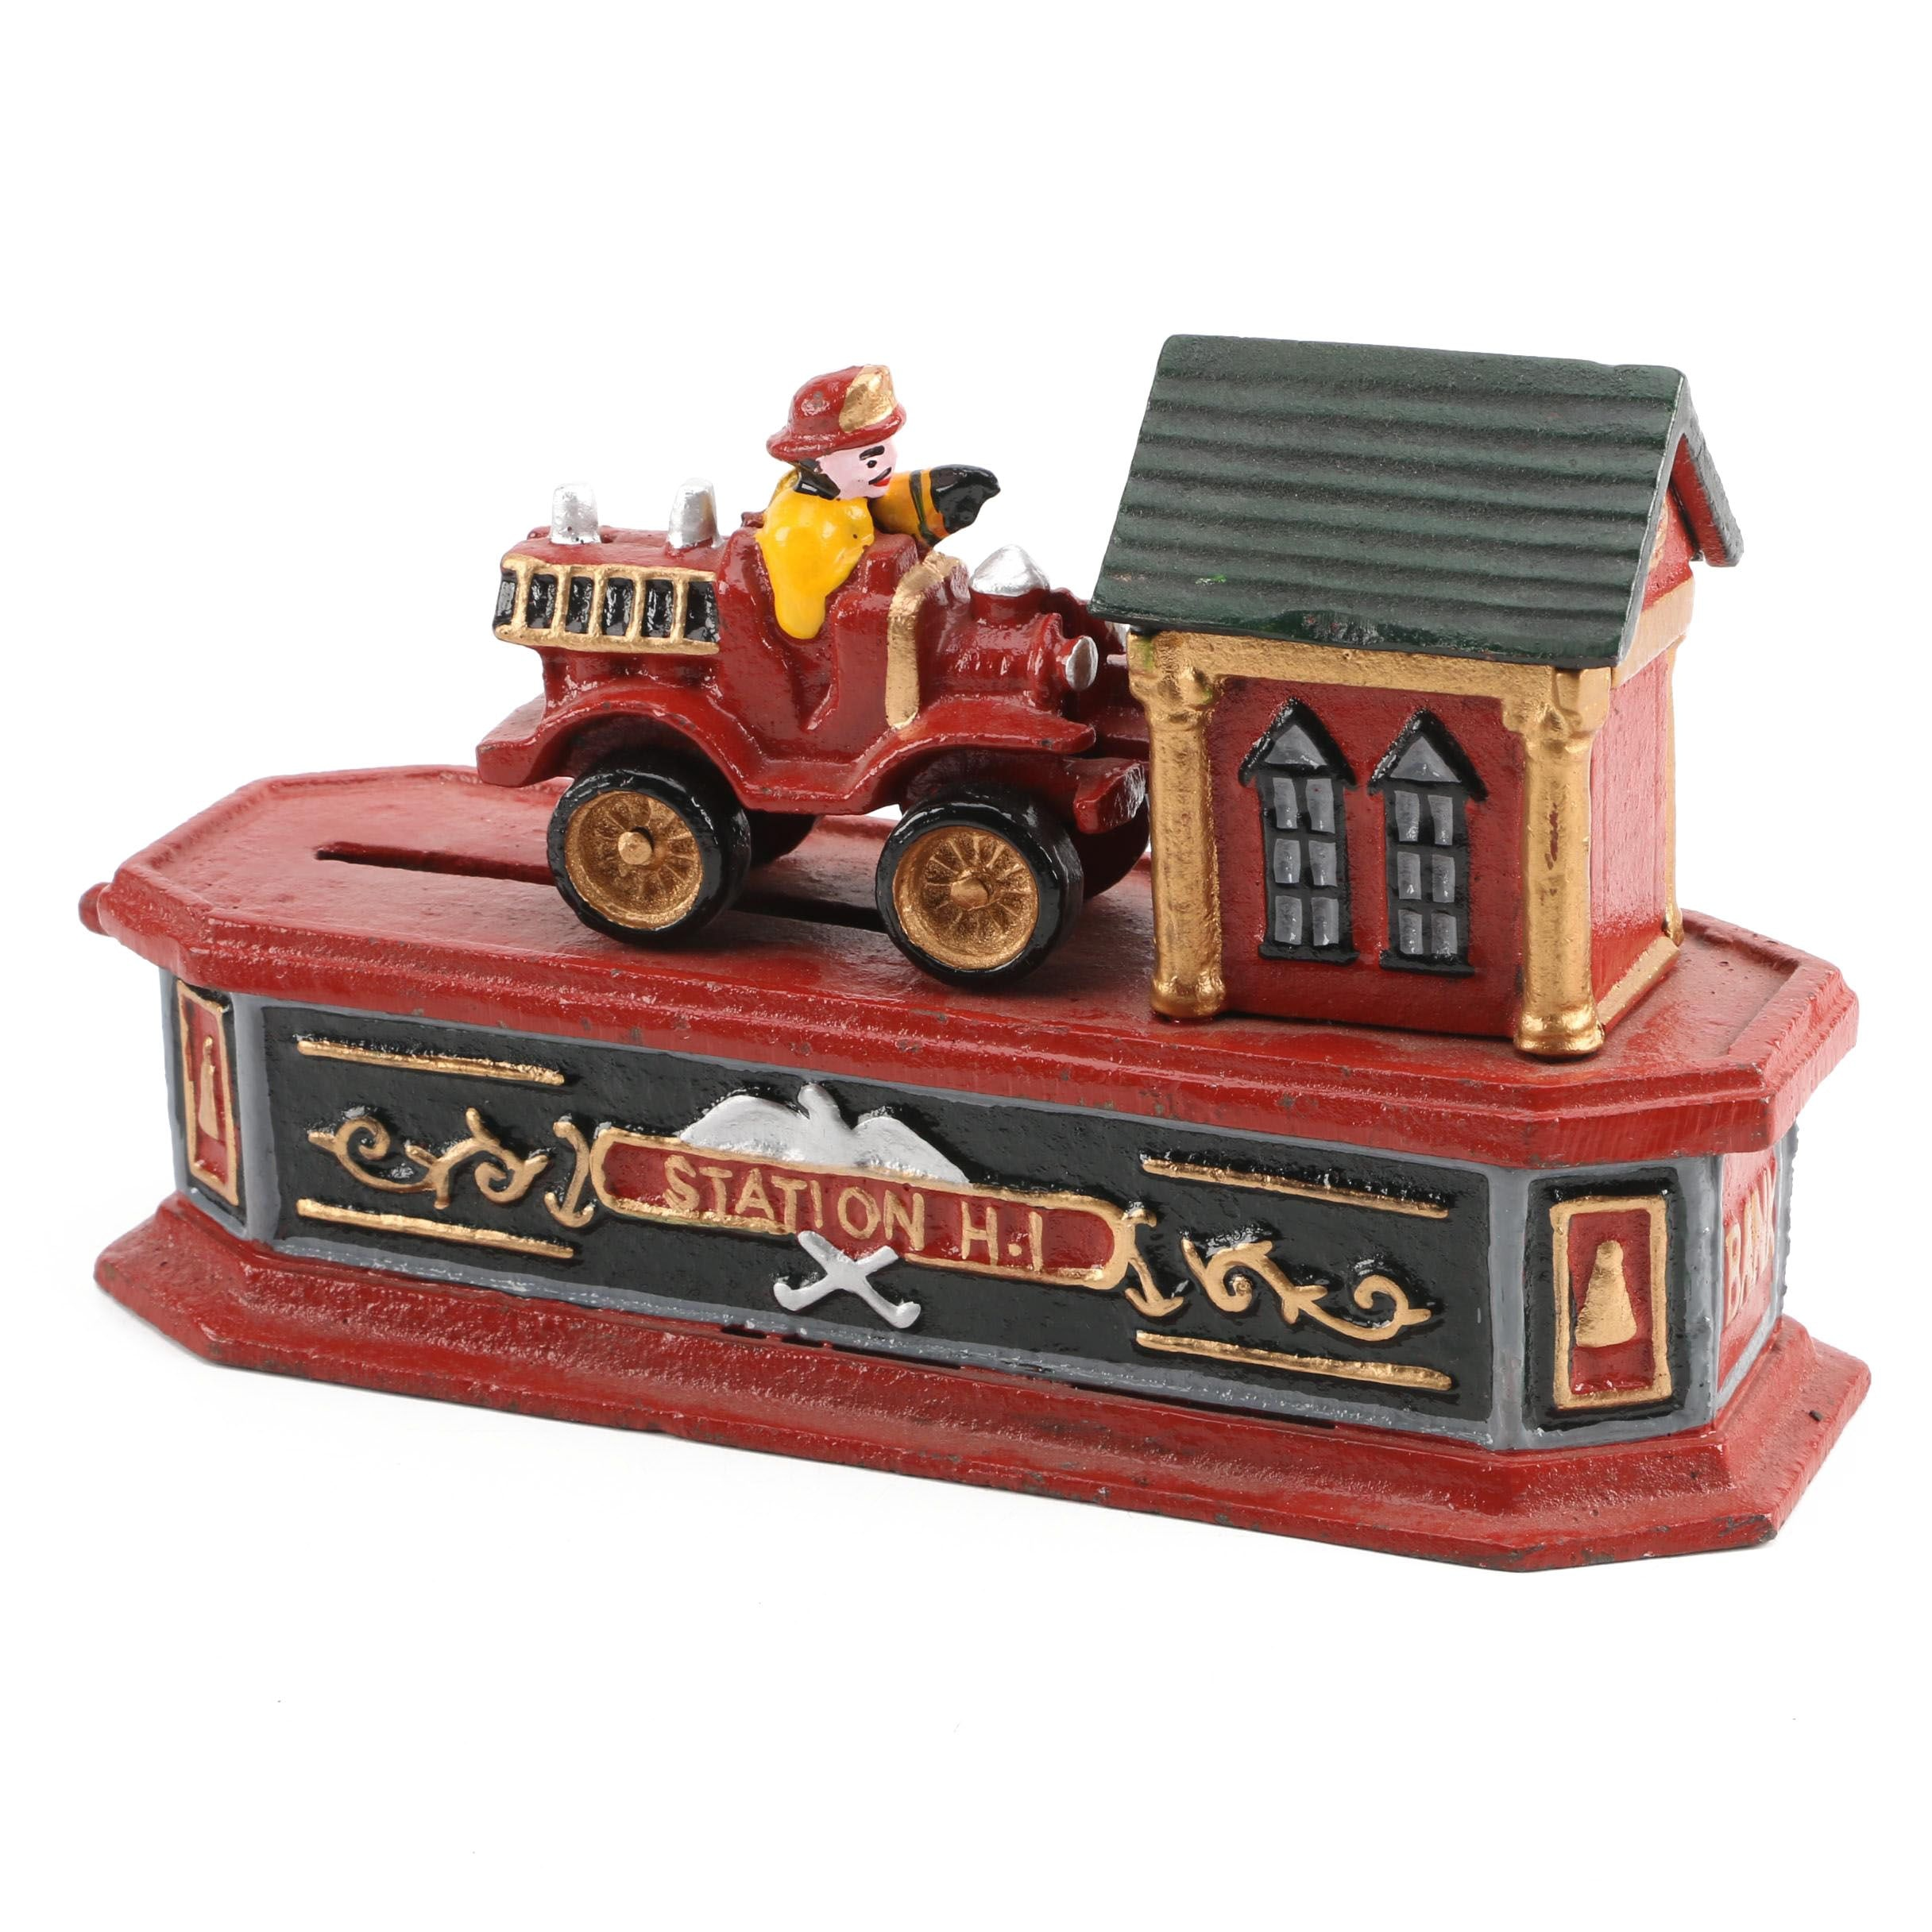 Vintage Cast Iron Fire Engine Mechanical Bank